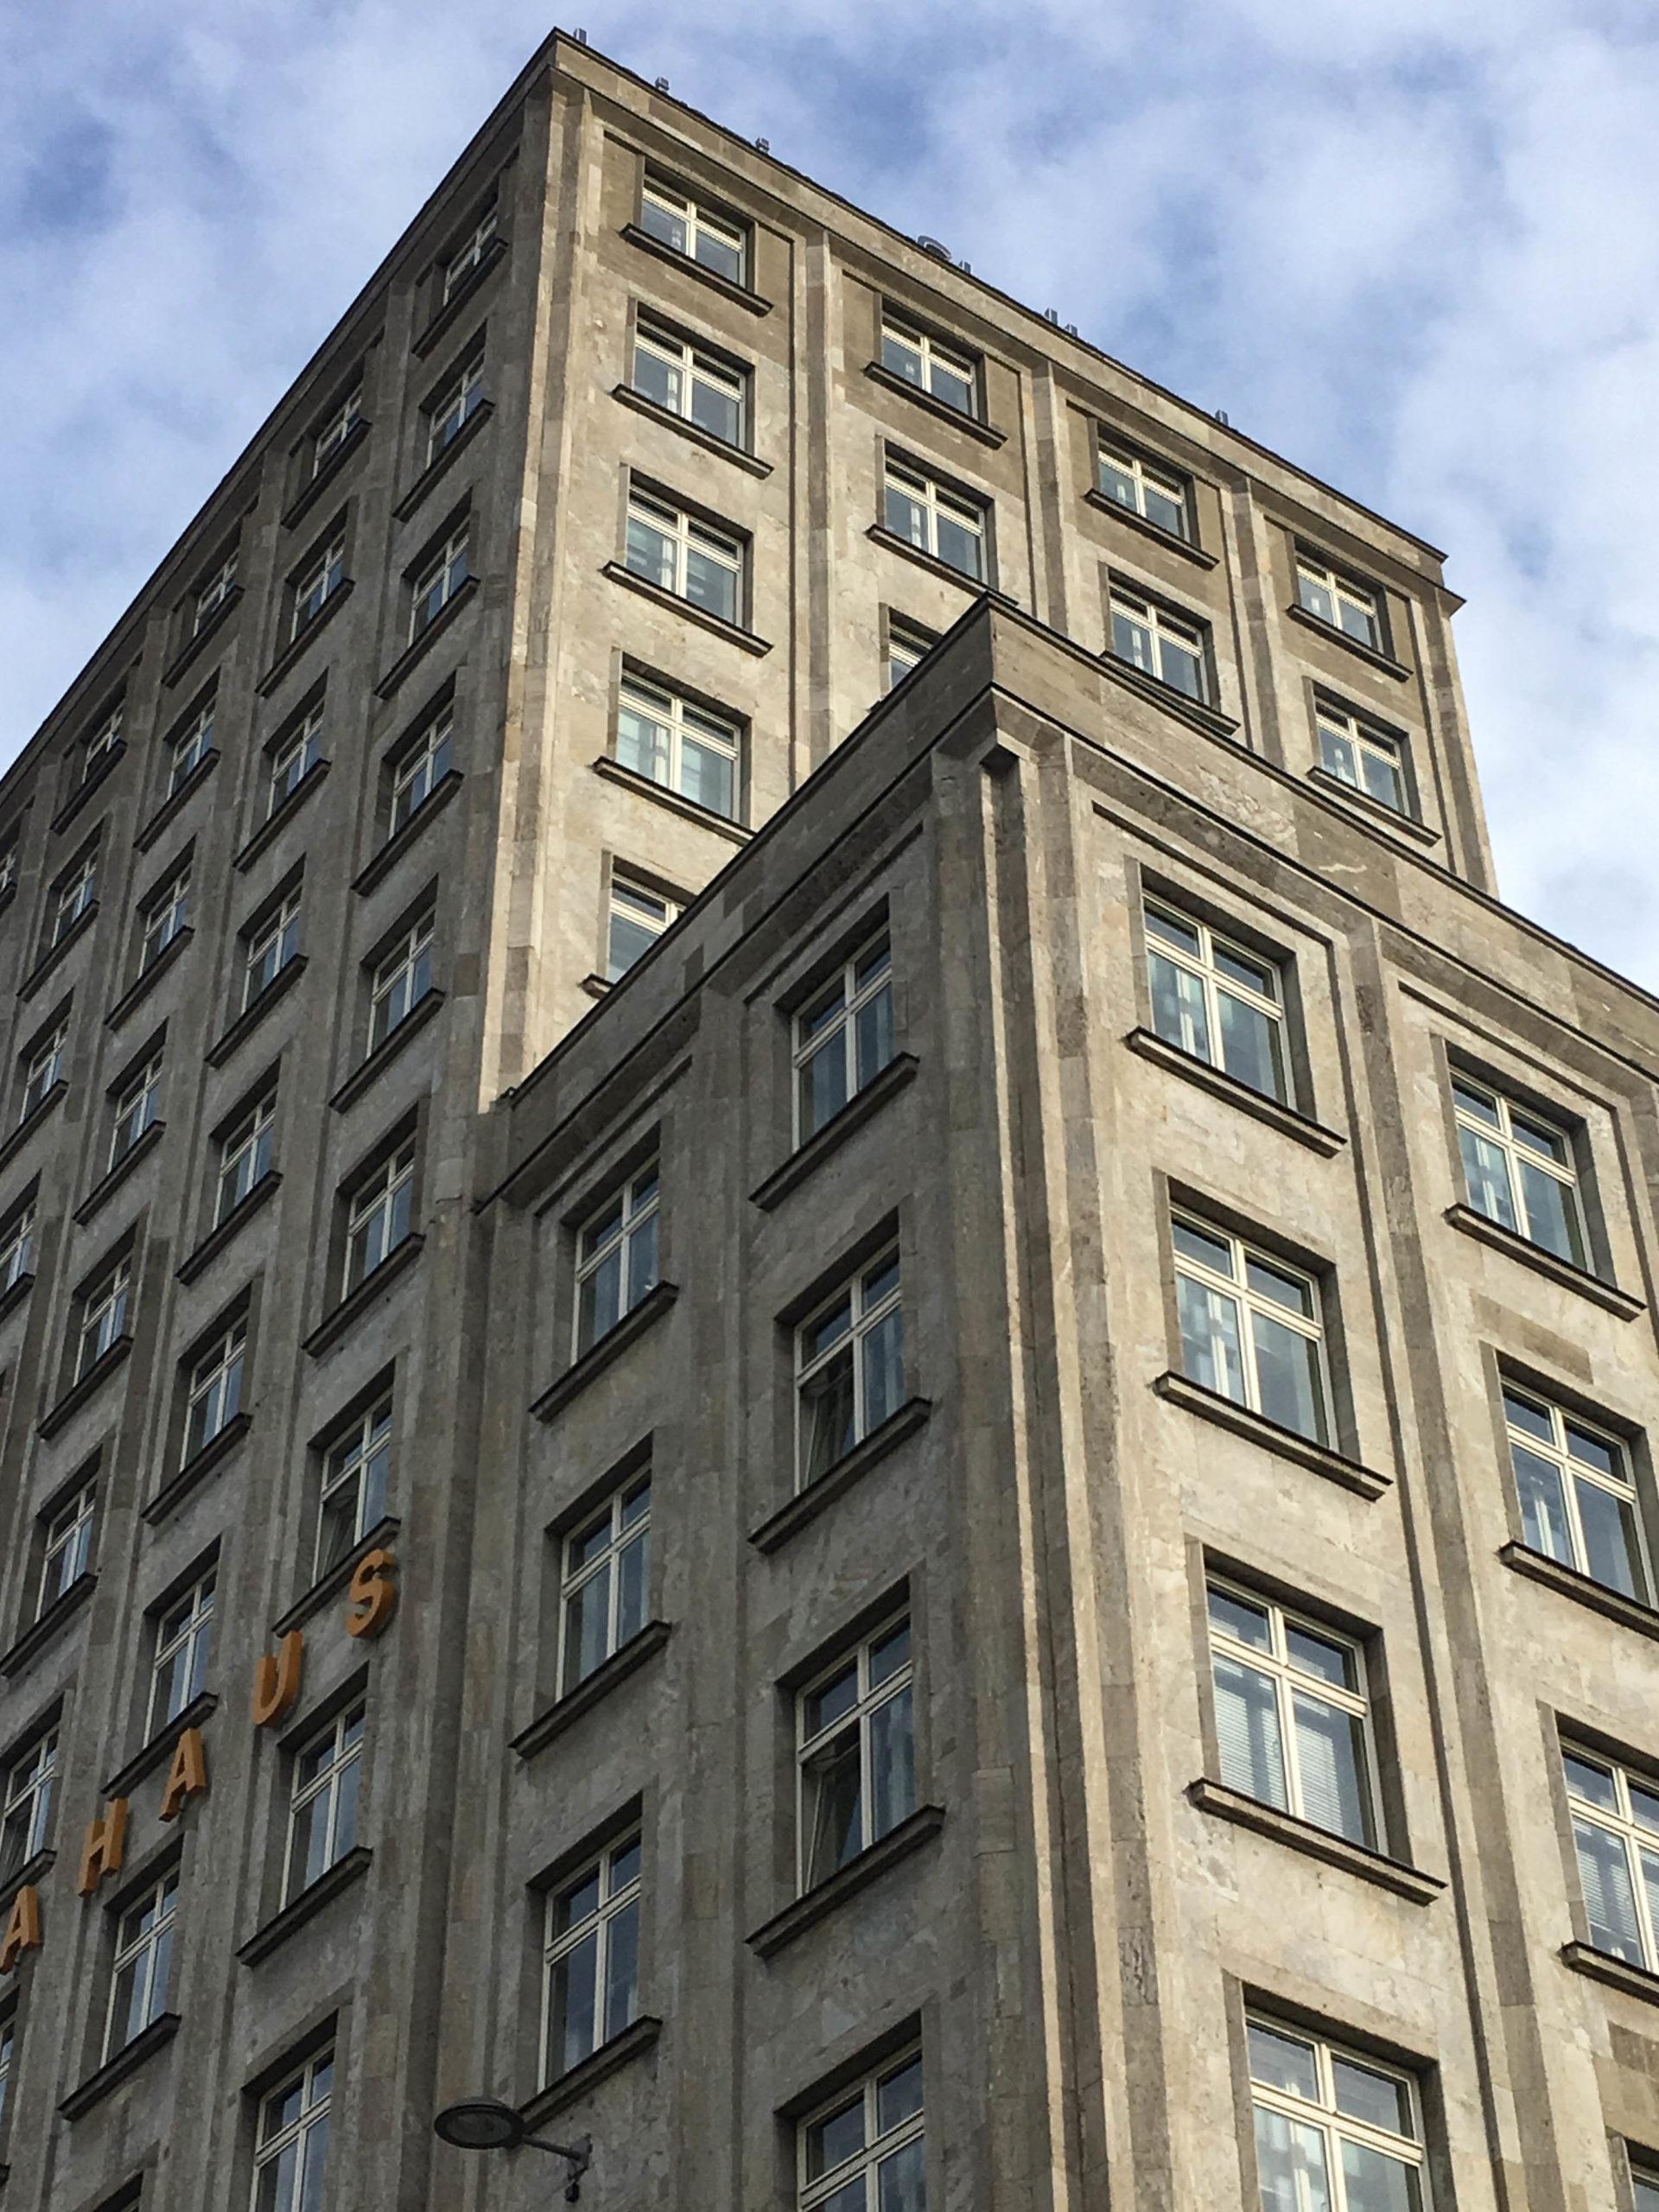 Europahaus, 1928-1930. Architekt: Otto Paul Burghardt